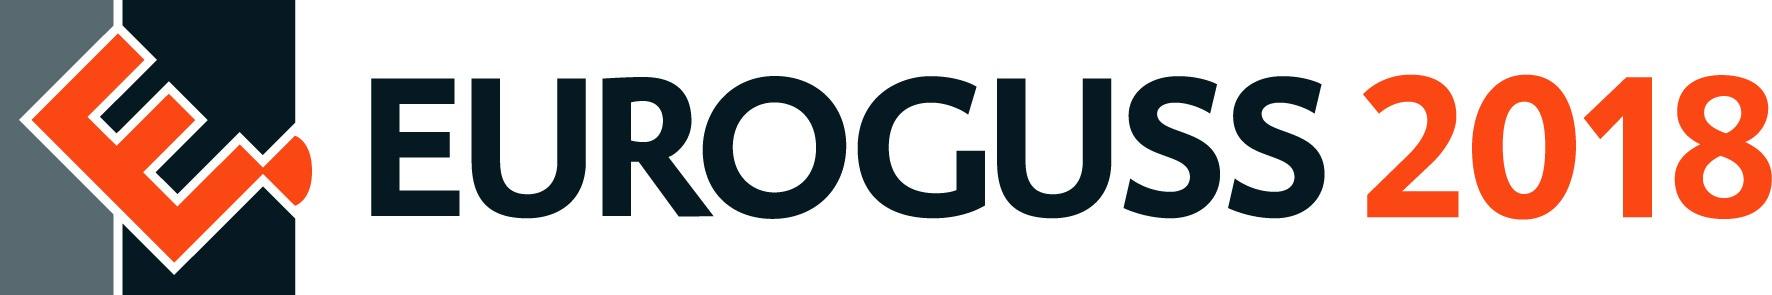 EUROGUSS_2018_Logo_farbig_positiv_300dpi_RGB_web.jpg